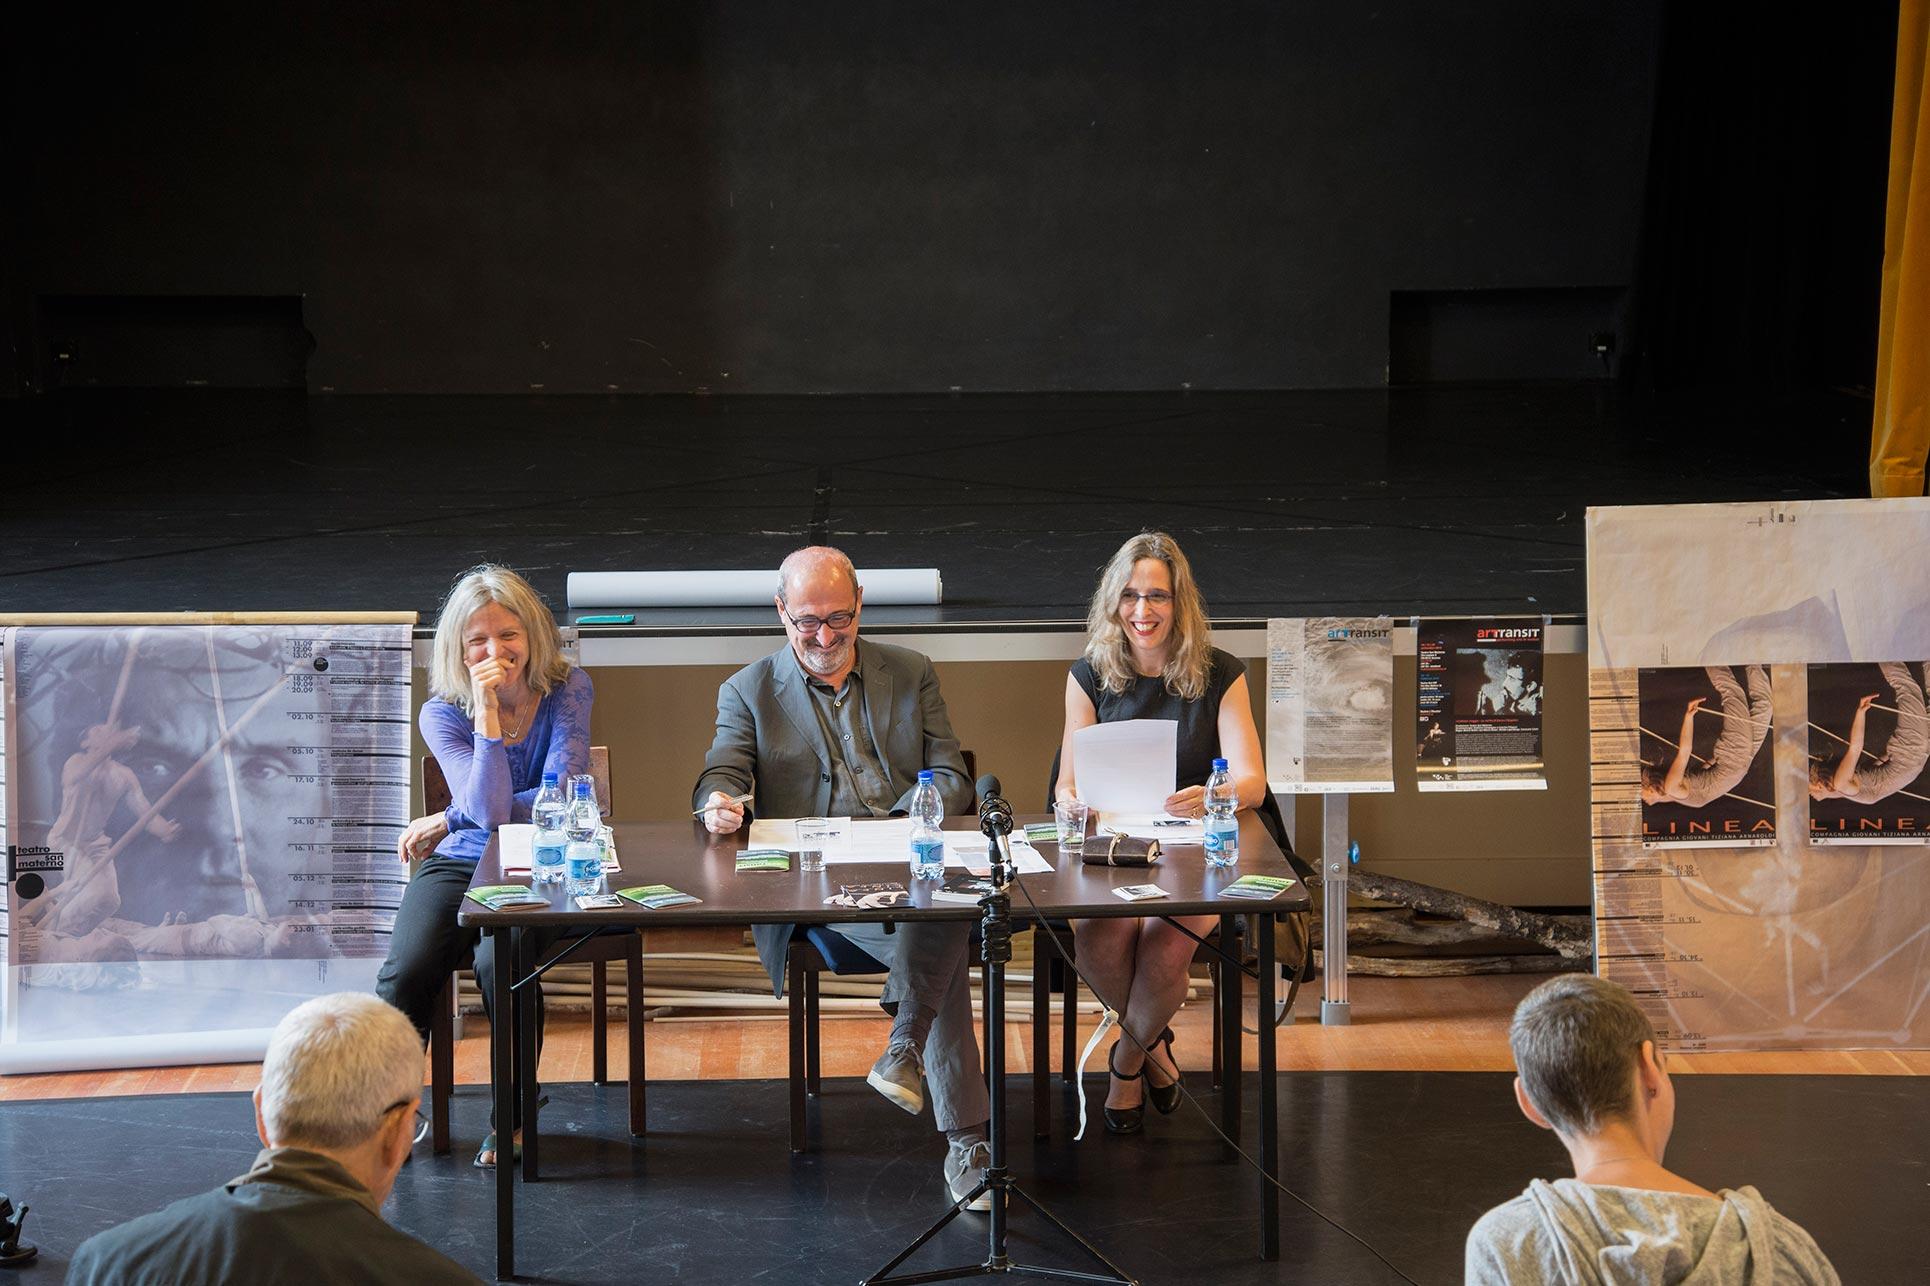 Tiziana Arnaboldi, Domenico Lucchini, Barbara Fässler (Photo: Alessandro Ligato)